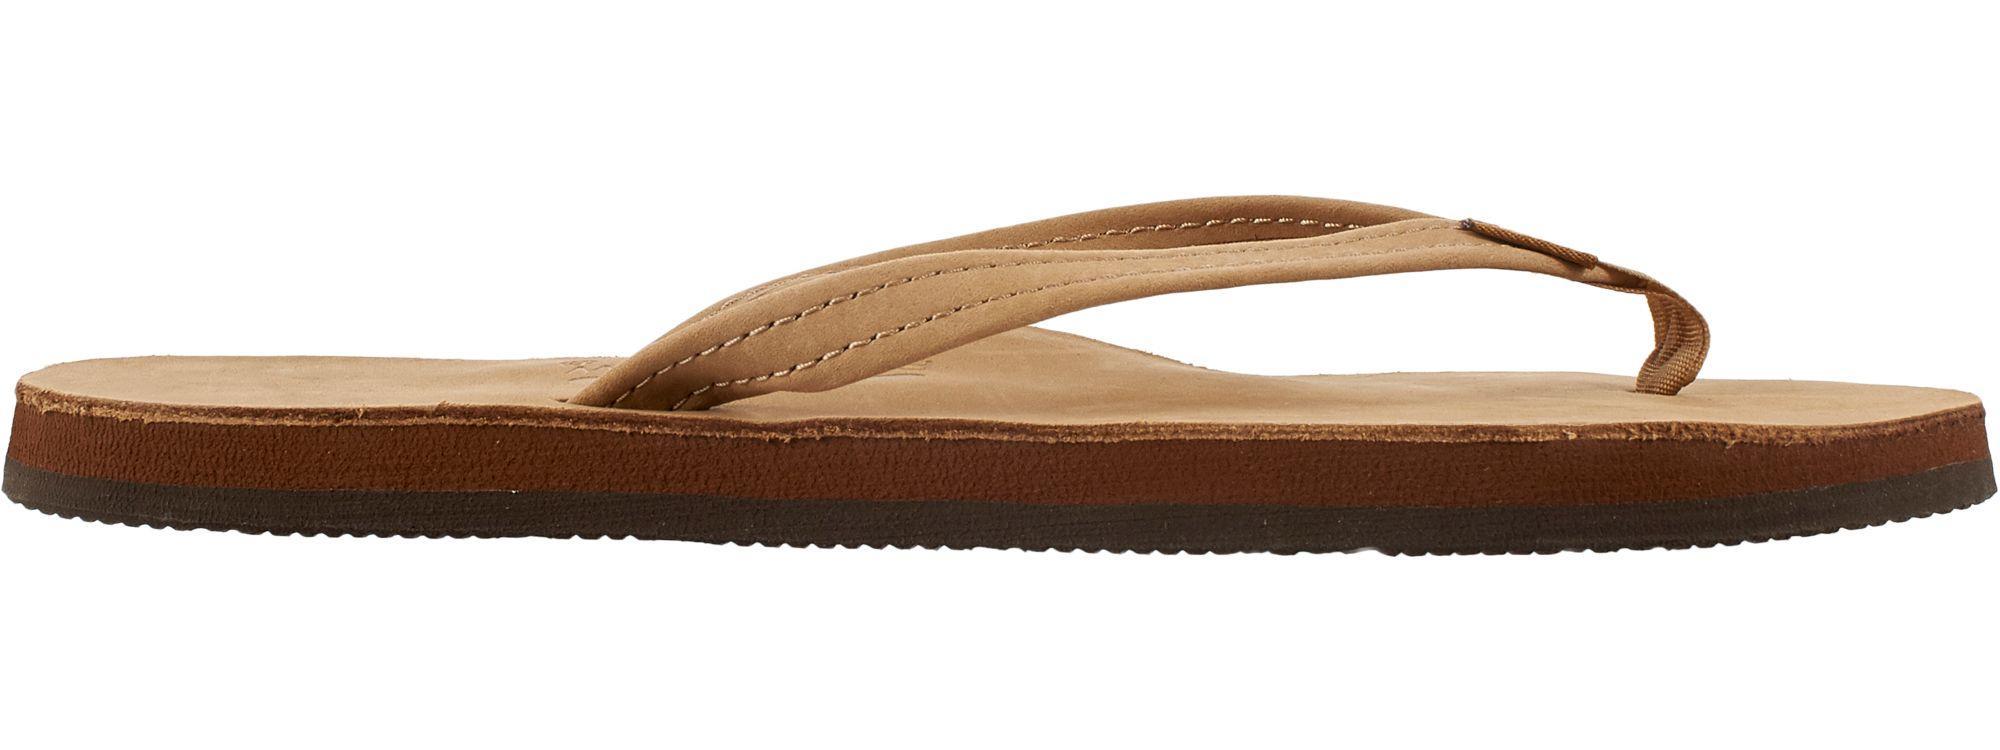 7e8717f5a Lyst - Rainbow Sandals Narrow 301 Flip Flops in Brown